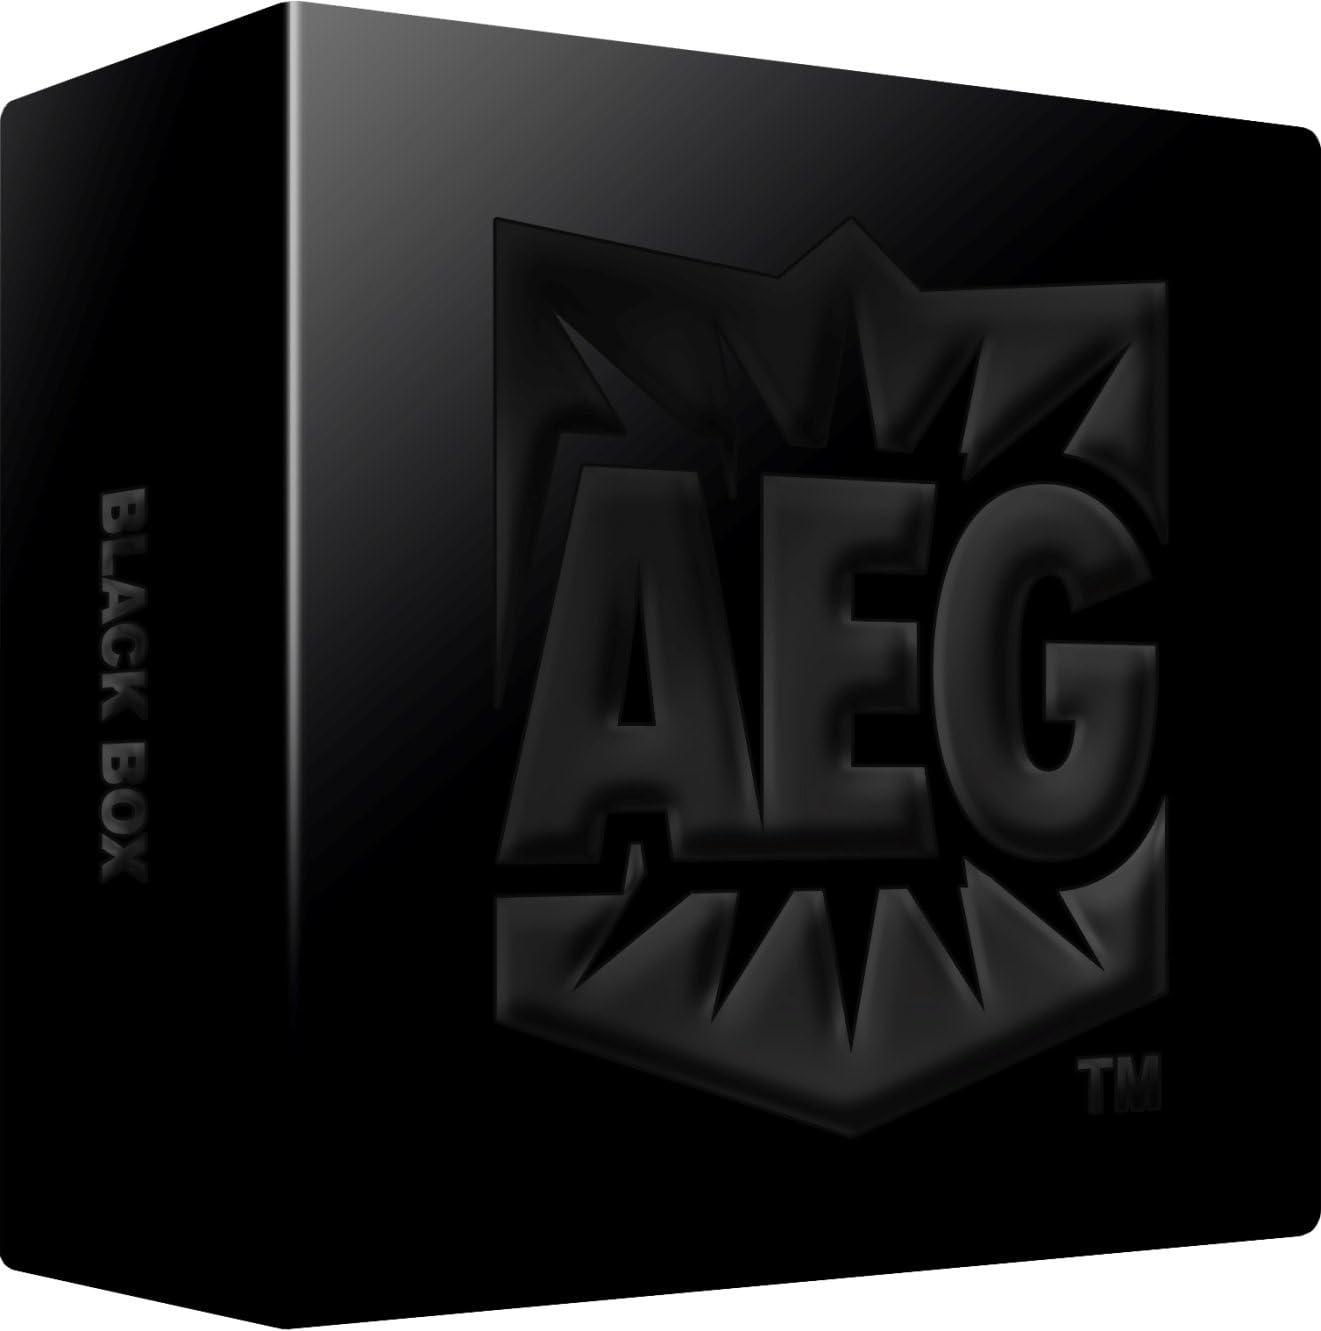 Amazon Com Black Friday Black Box 2014 Toys Games